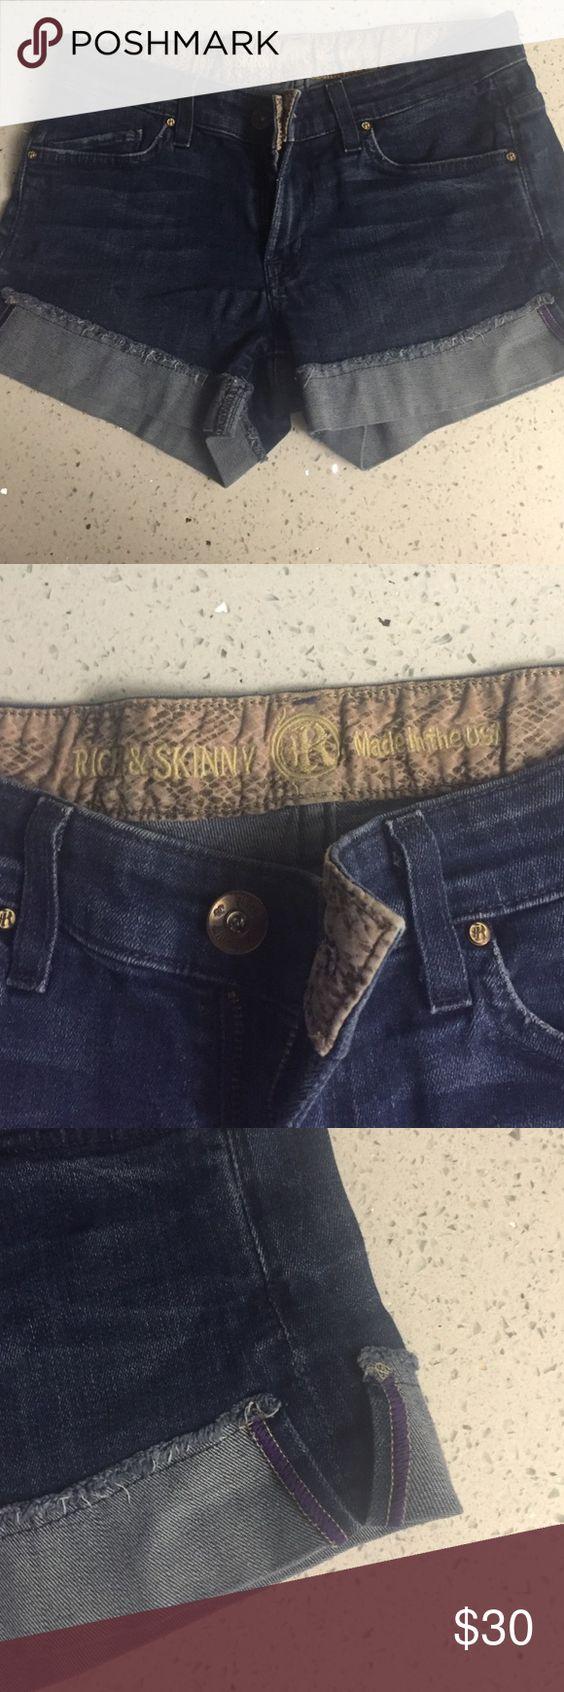 Rich and Skinny Jean Shorts Great summer shorts, dark wash, purple accent. Rich & Skinny Shorts Jean Shorts